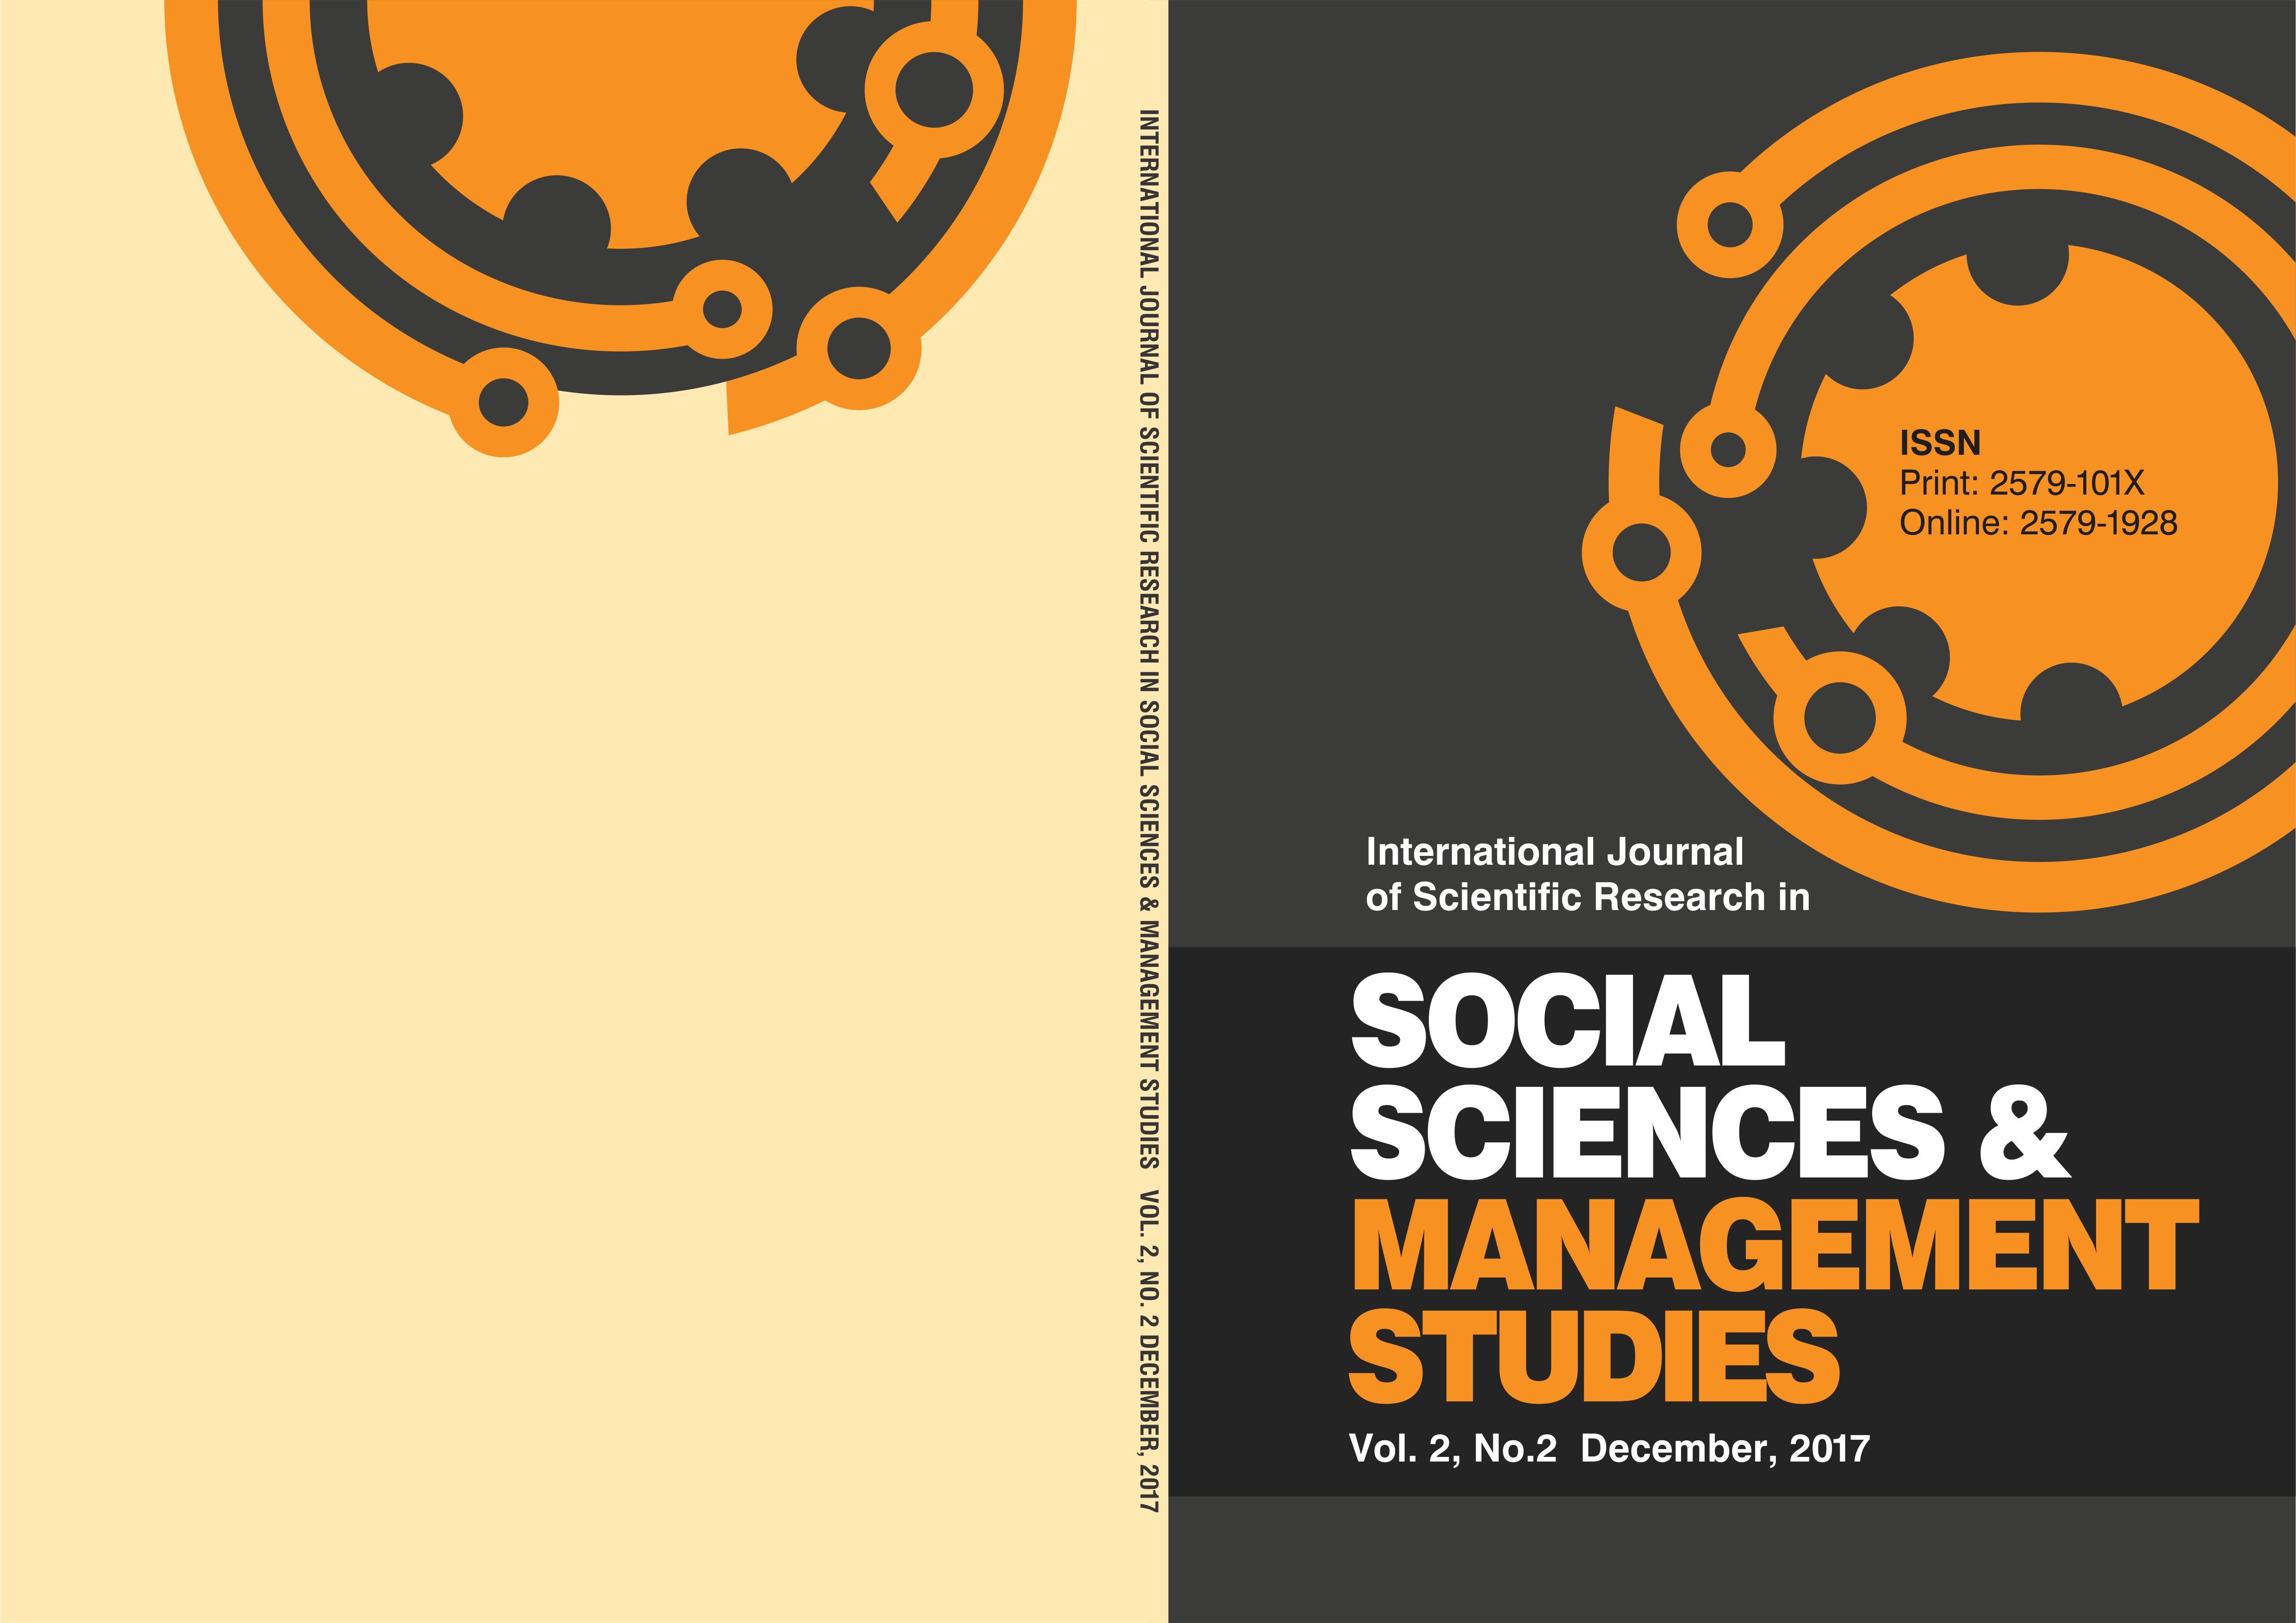 Intl Jrnl of Sci Research in Social Sciences & Mgt Studies Vol2  No2